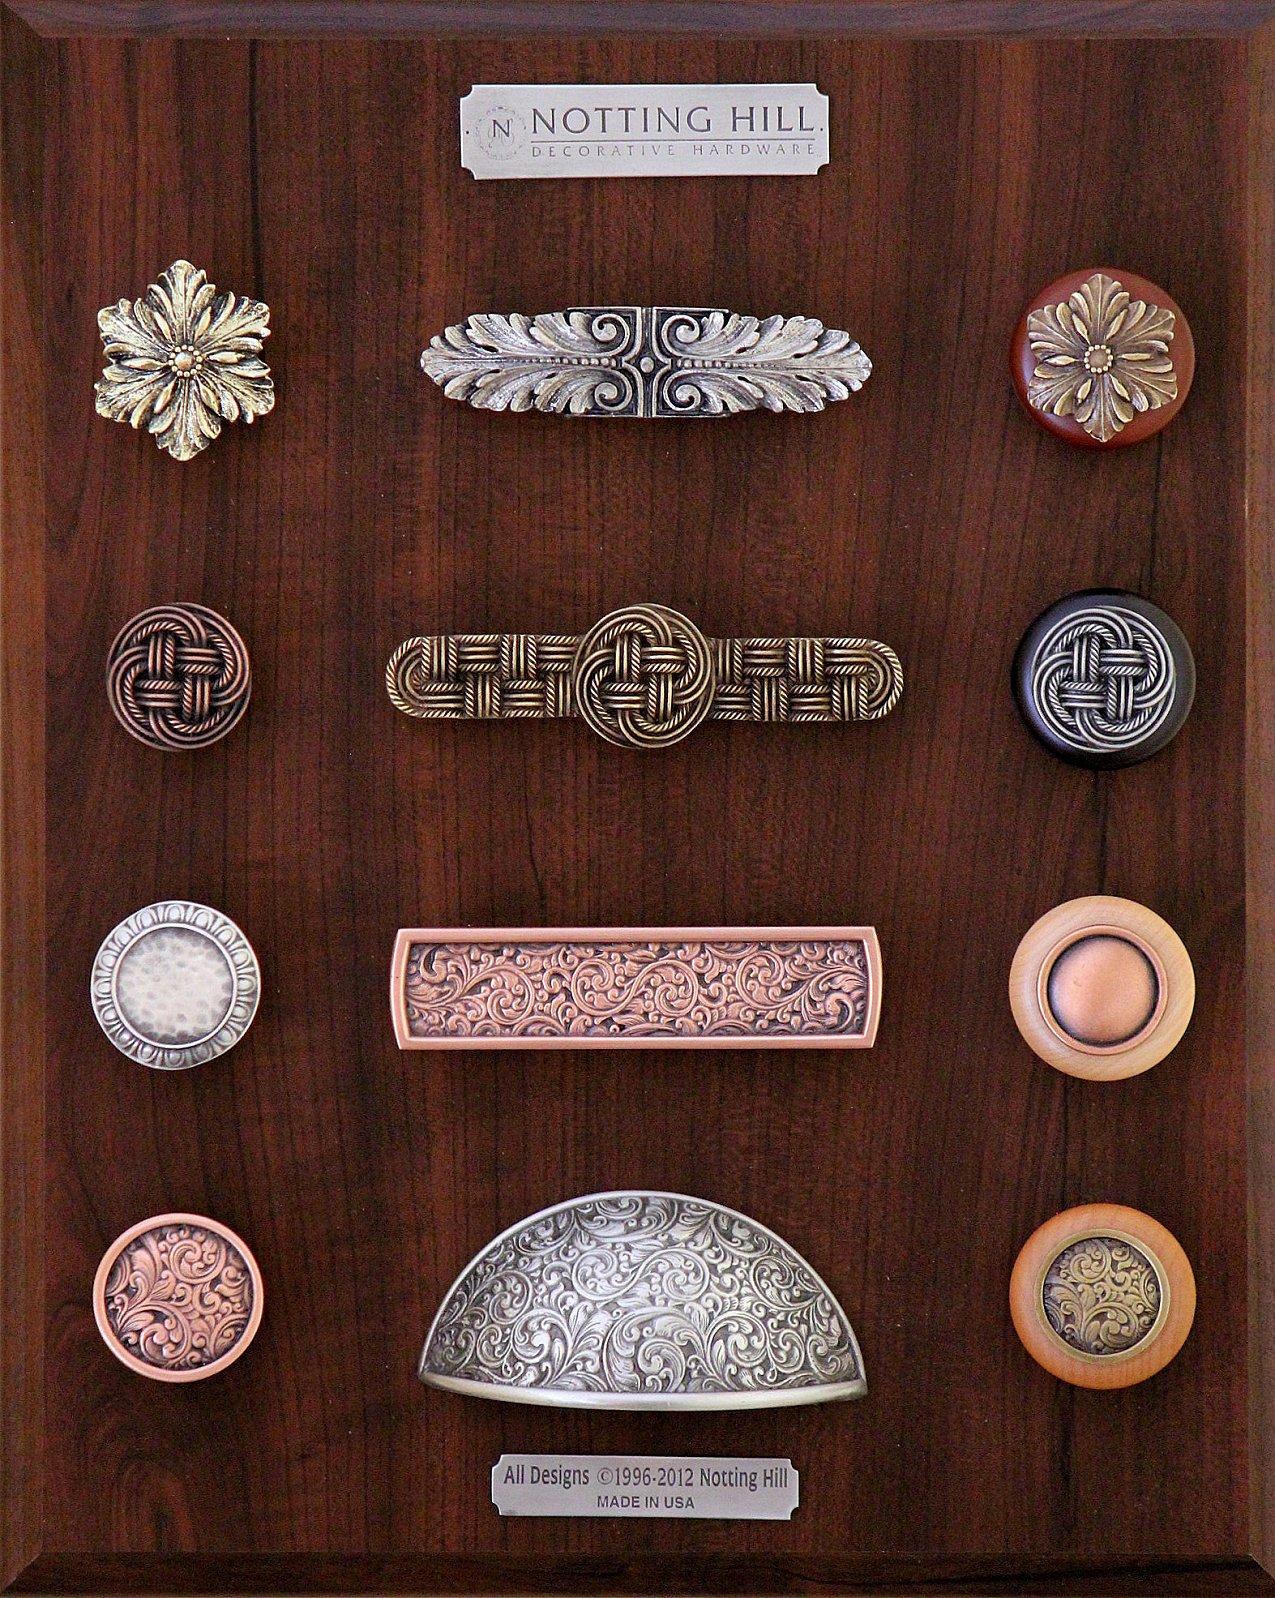 Opulent Flower Knob, Pull, & Wood Knob; Classic Weave Knob, Pull & Wood Knobs; Egg & Dart Knob; Saddleworth Pull; Plain Dome Wood Knob; Saddleworth Knob, Bin Pull & Wood Knob.